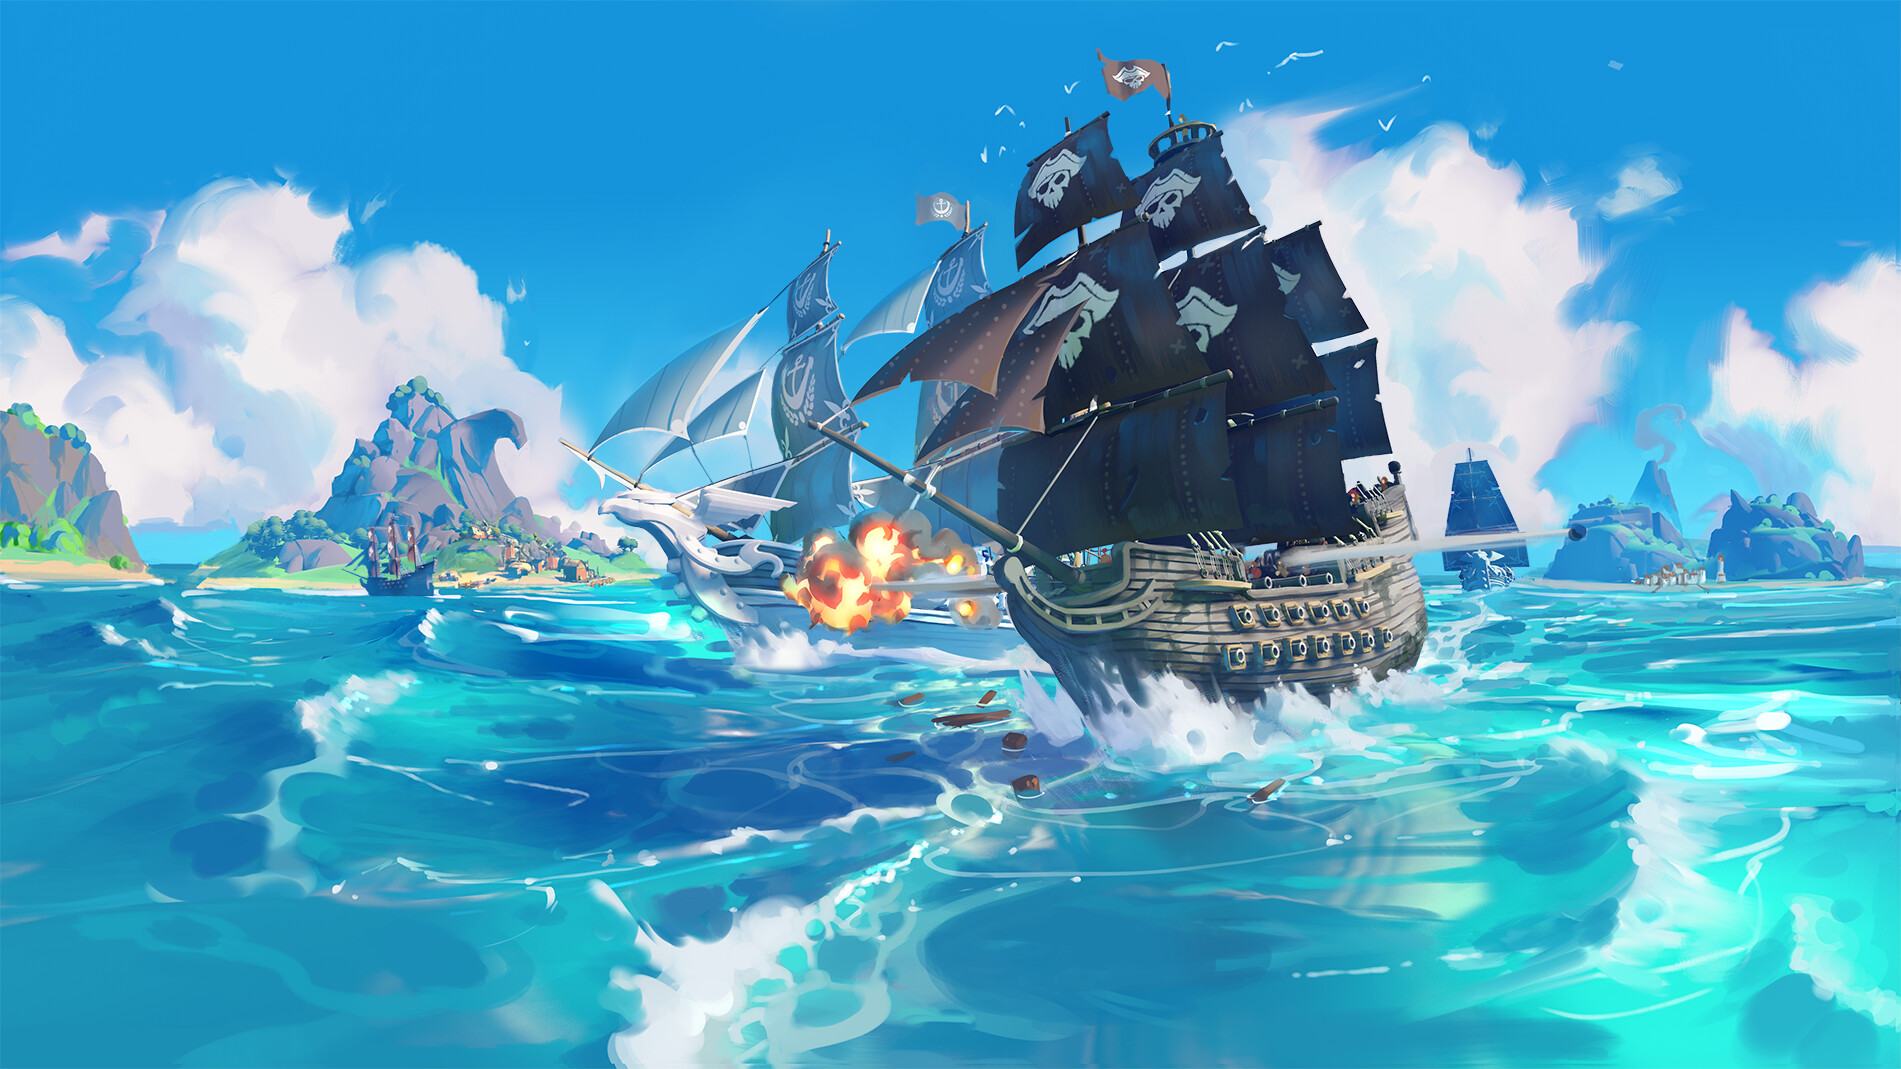 General 1901x1069 Roberto Gatto digital art pirates ship waves sea island clouds birds flag planks